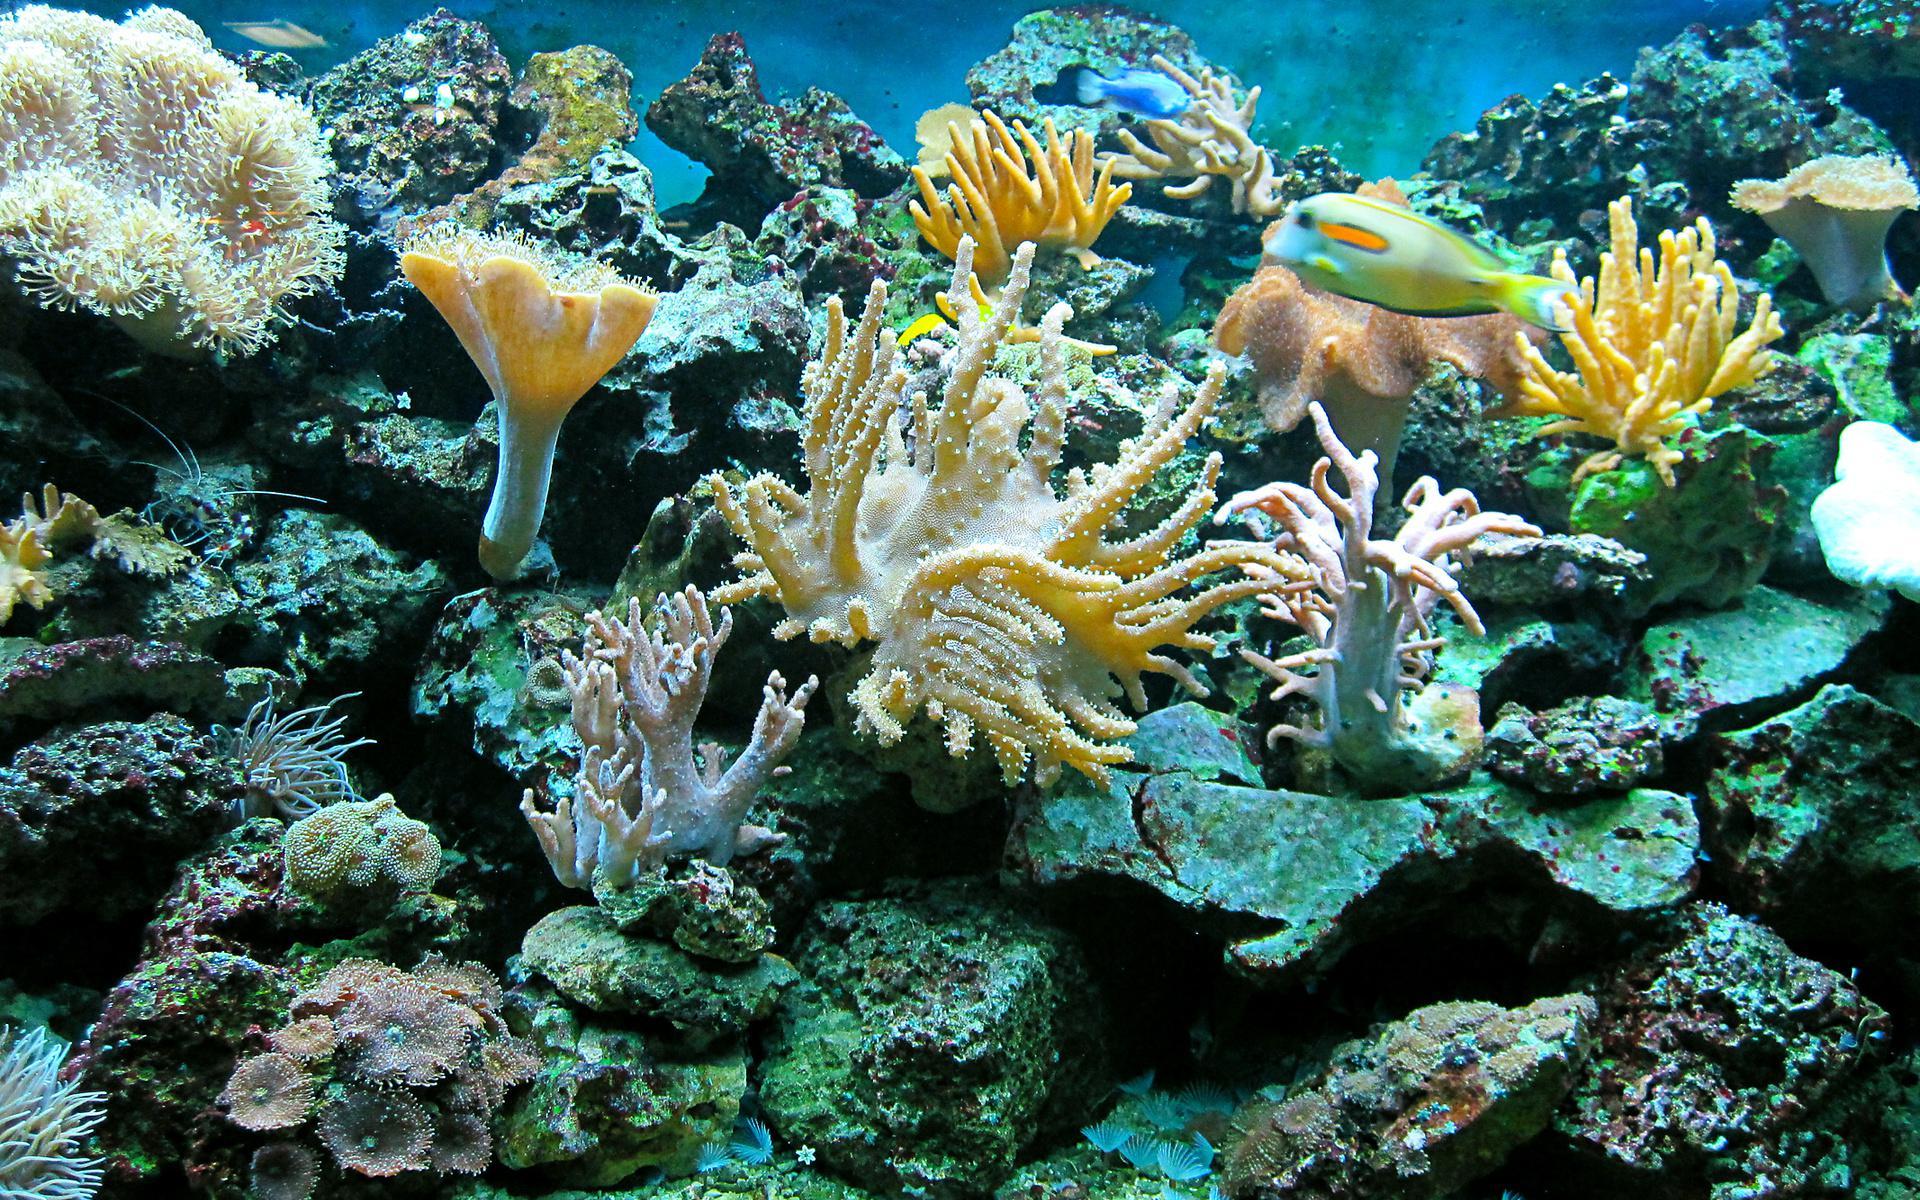 3d Live Wallpaper Acuarium Free Hd Sea Underwater Ocean Reef Fish Widescreen Wallpaper